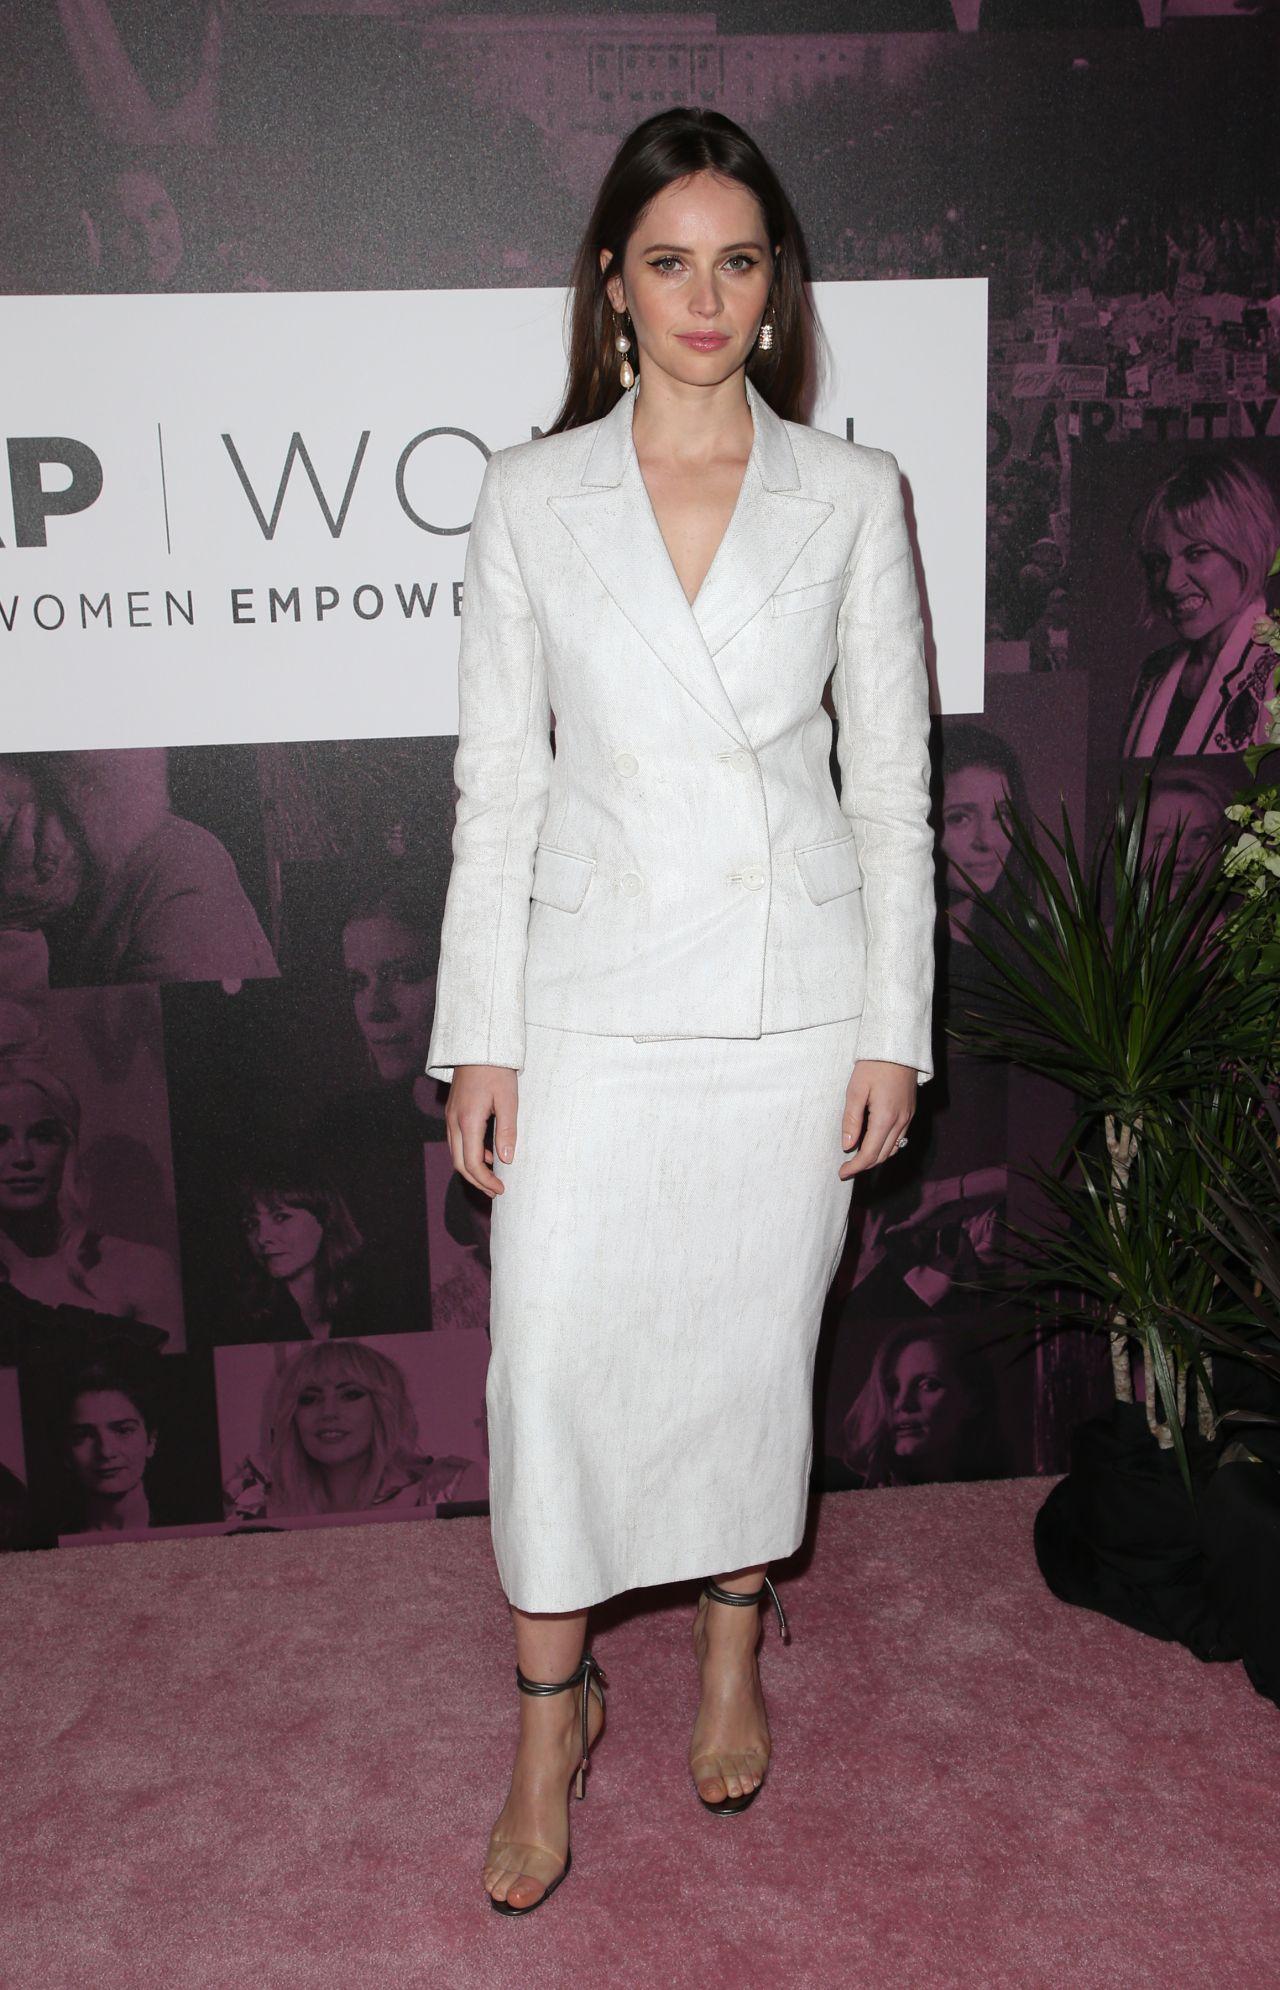 https://celebmafia.com/wp-content/uploads/2018/11/felicity-jones-thewrap-s-power-women-s-summit-11-02-2018-10.jpg